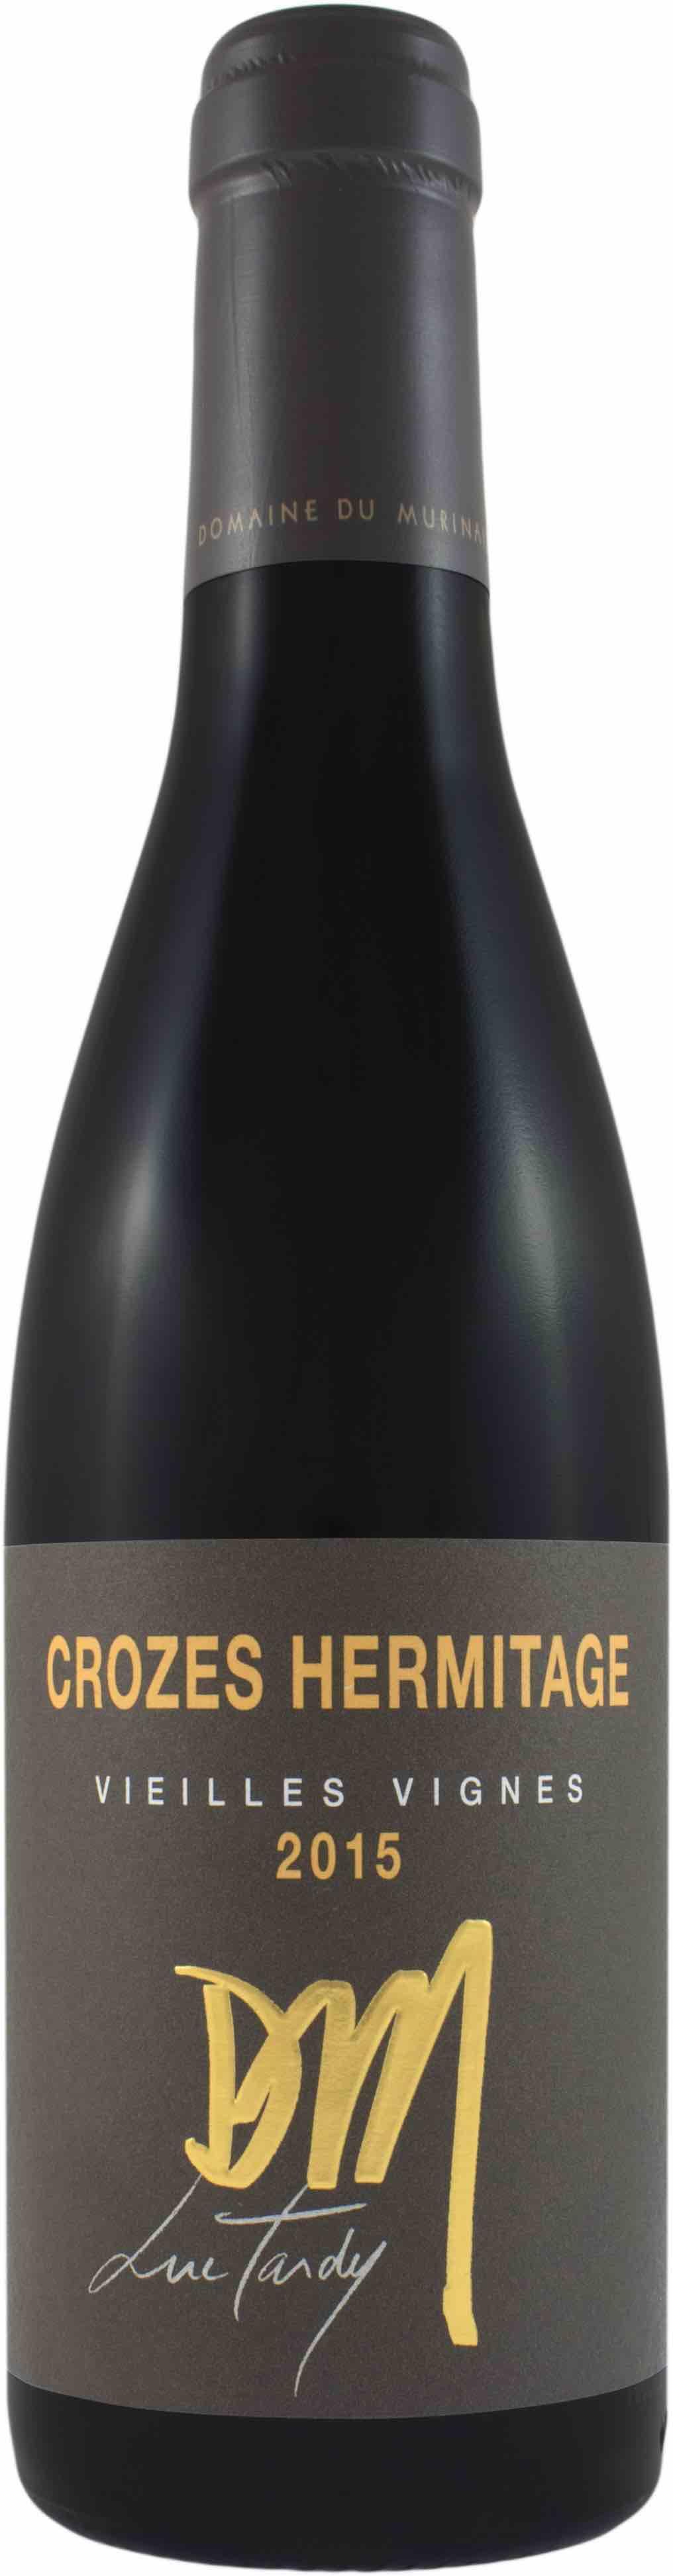 6 bottles of Crozes Hermitages - Vieilles Vignes 2015.